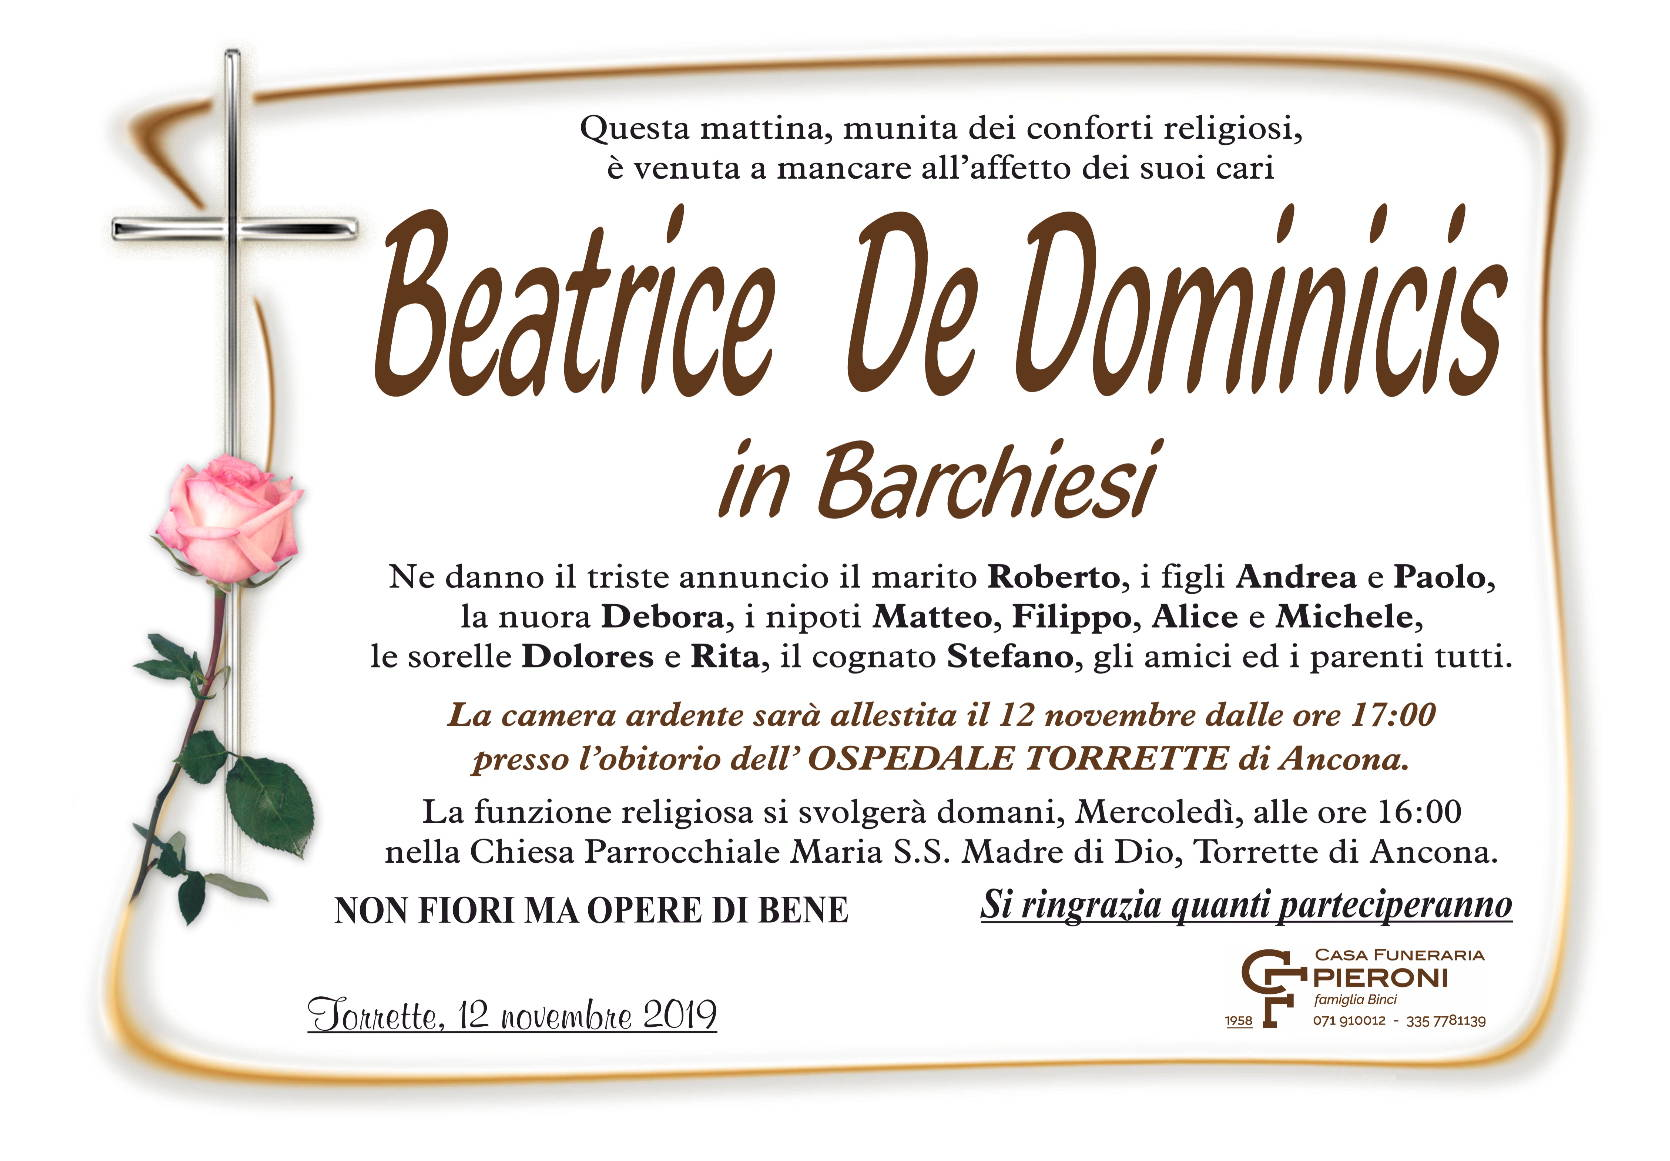 Beatrice De Dominics